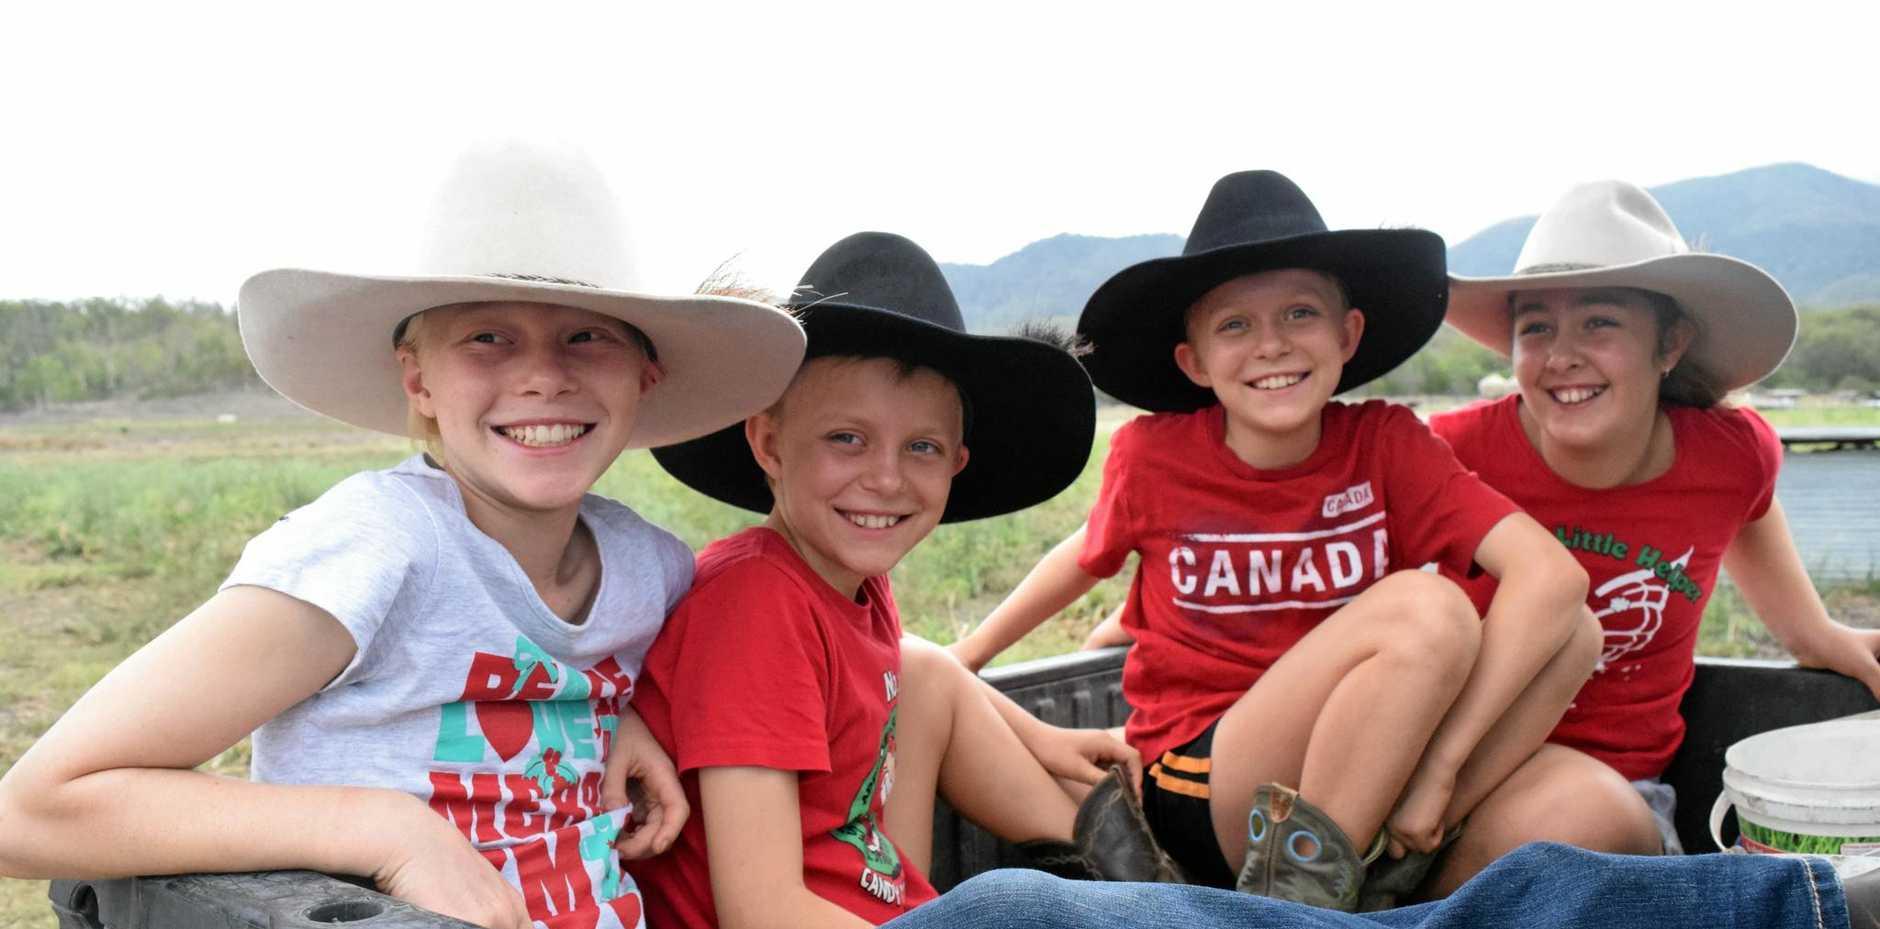 FARM TOURS: Hannah, Laura and Megan Bauman and Tembi Galloway visit the Freckle Farm breeding sows.